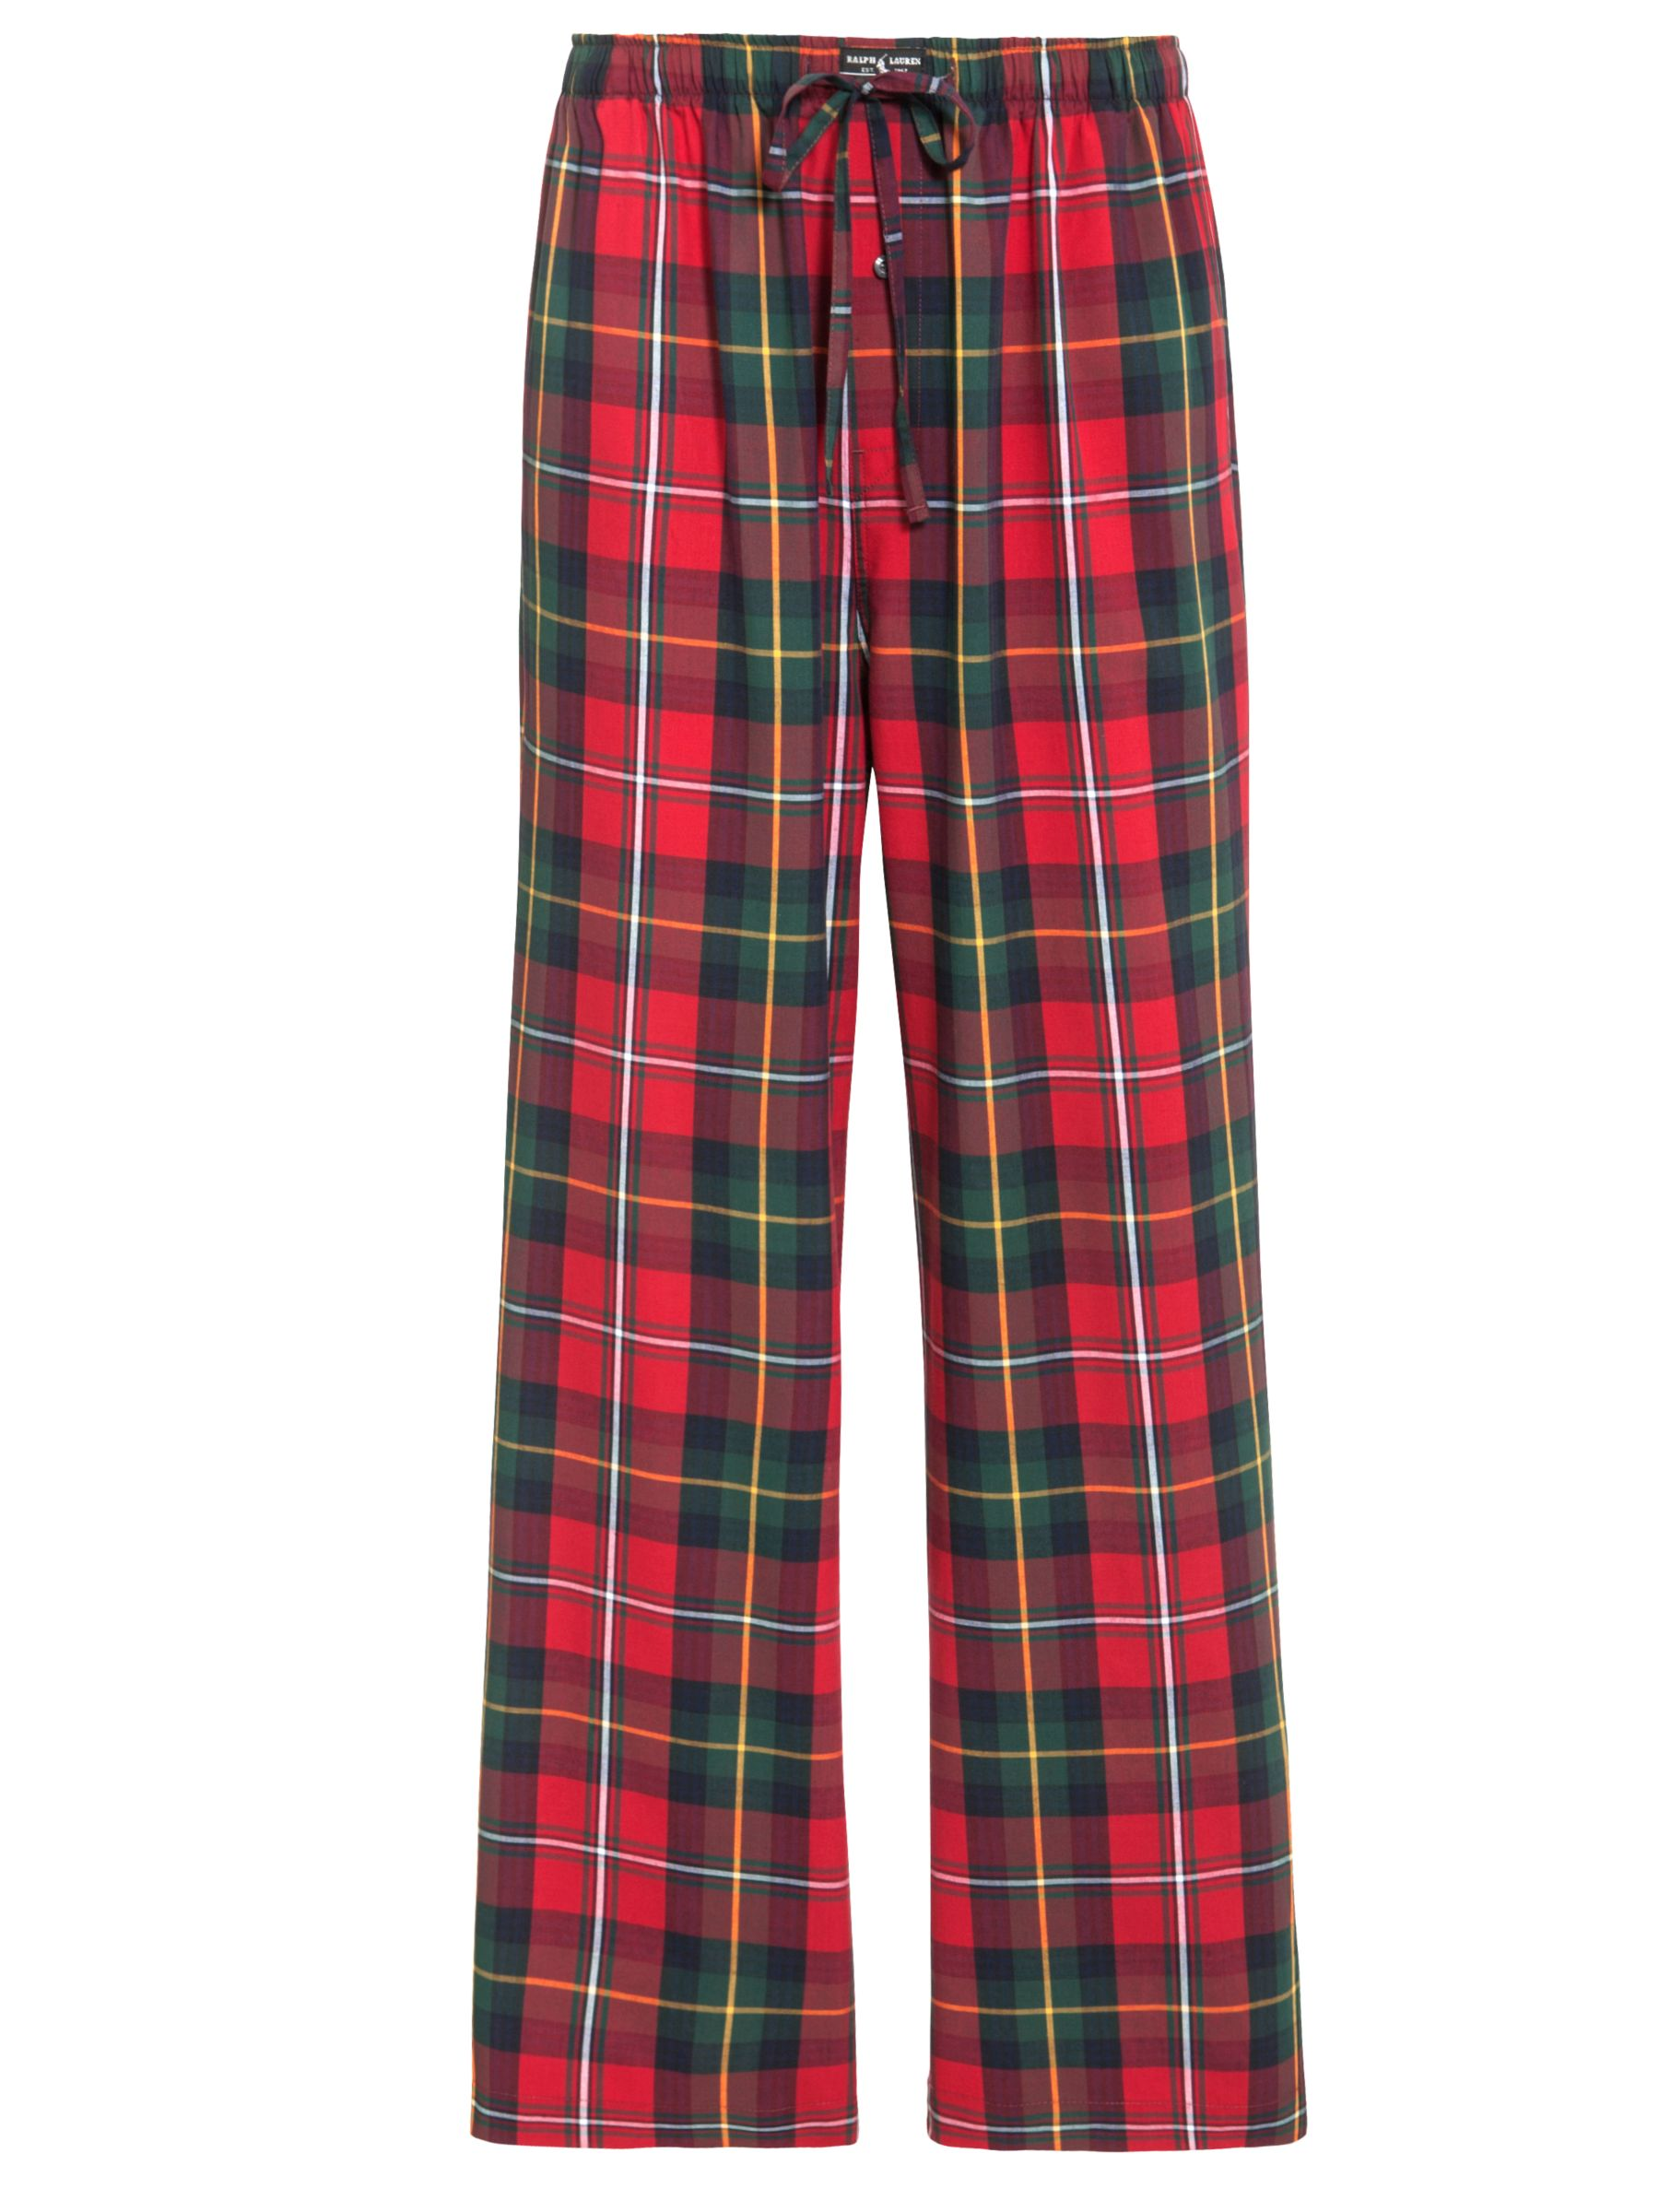 Polo Ralph Lauren McNeil Flannel Sleep Pants, Red